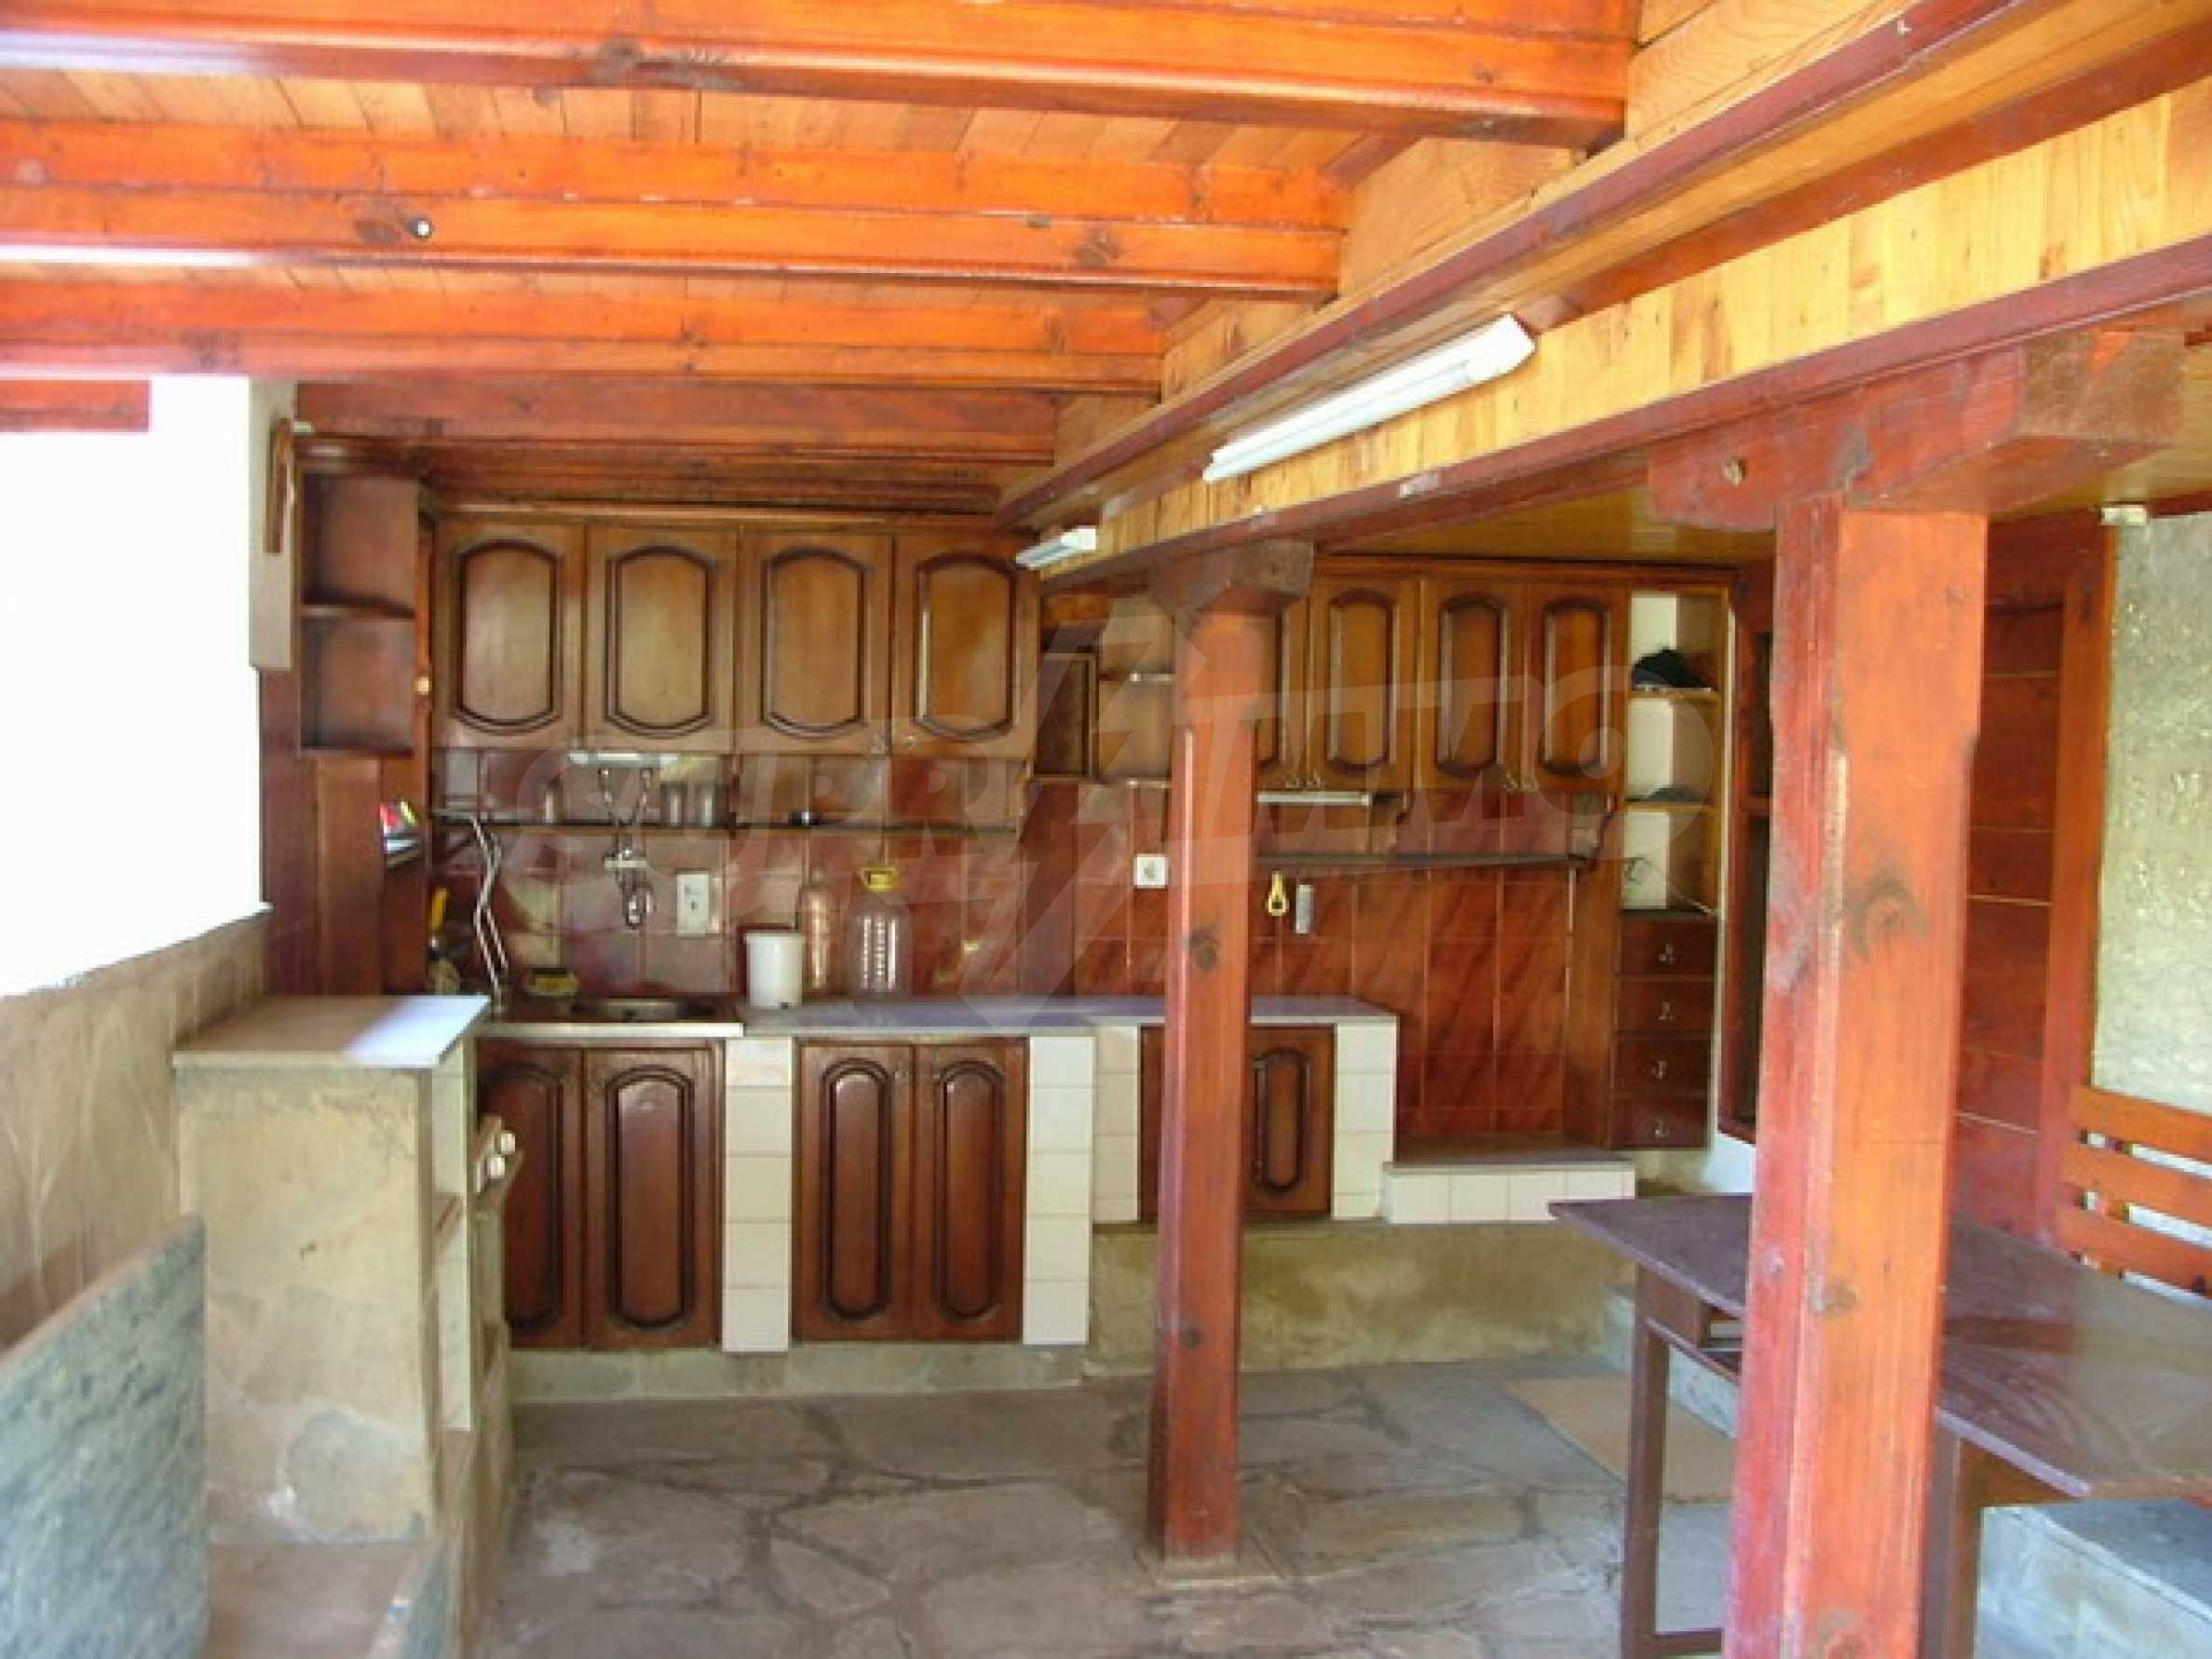 Stilvoll renovierte Villa 12 km entfernt. von Veliko Tarnovo 19